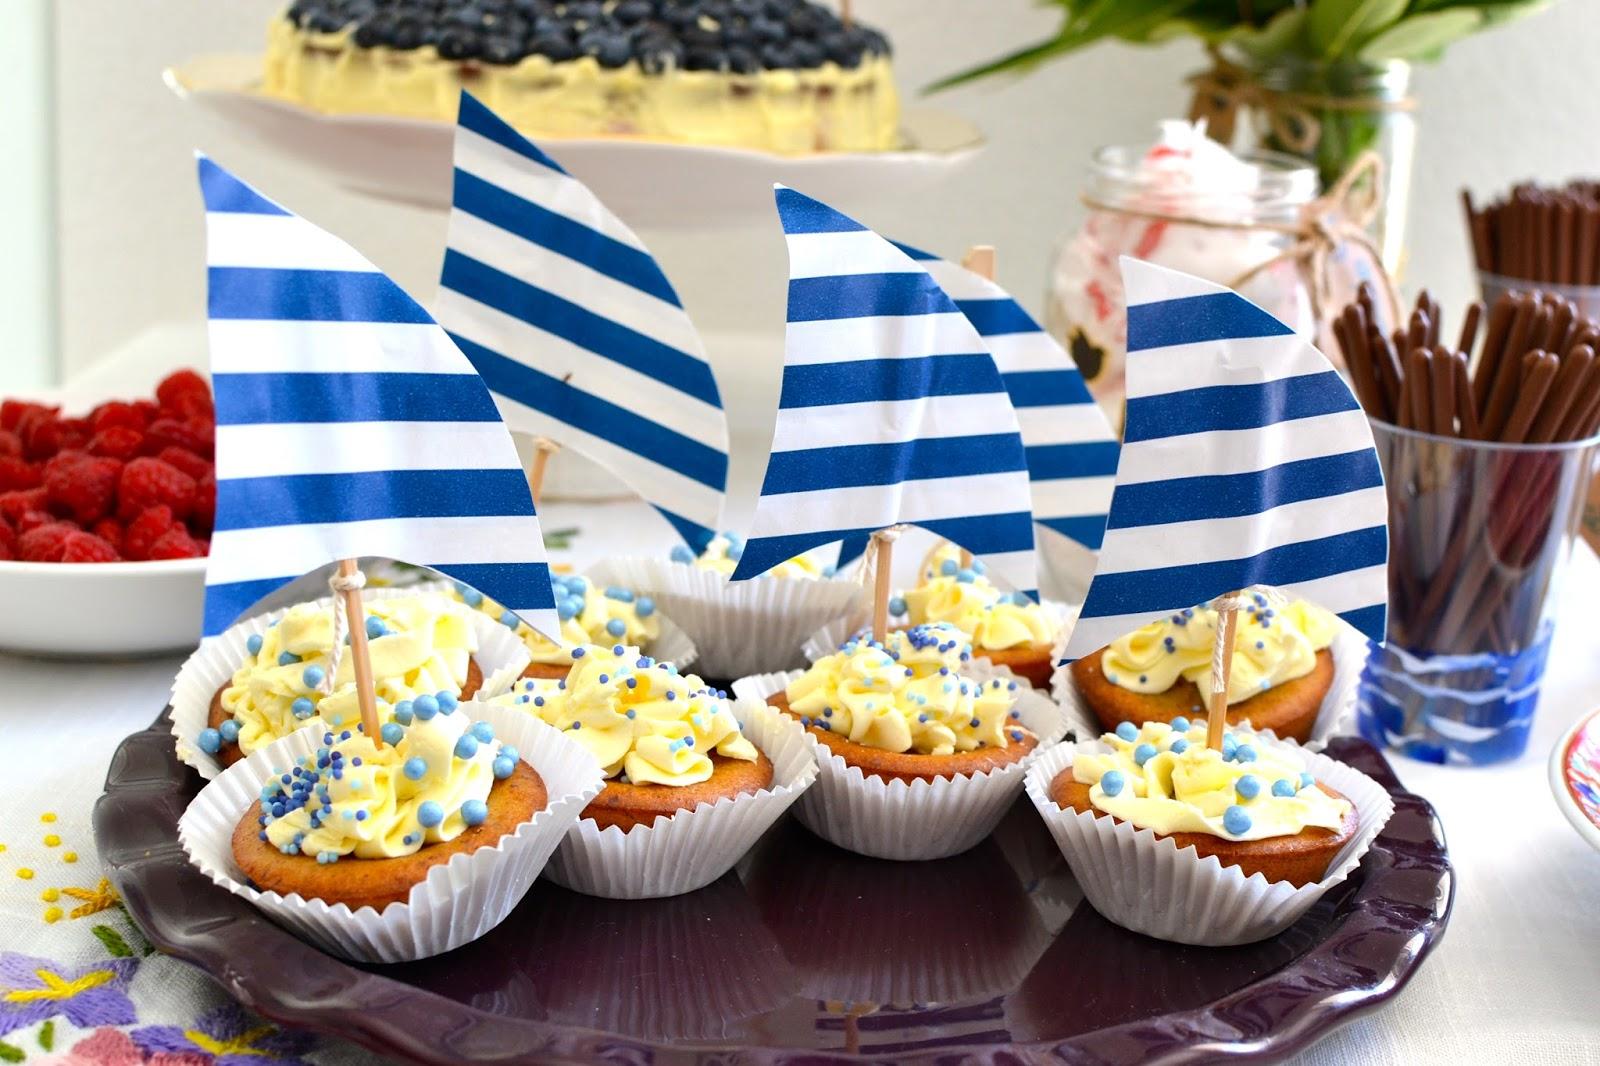 Una babyshower marinera a golpe de objetivo - Fiesta marinera decoracion ...